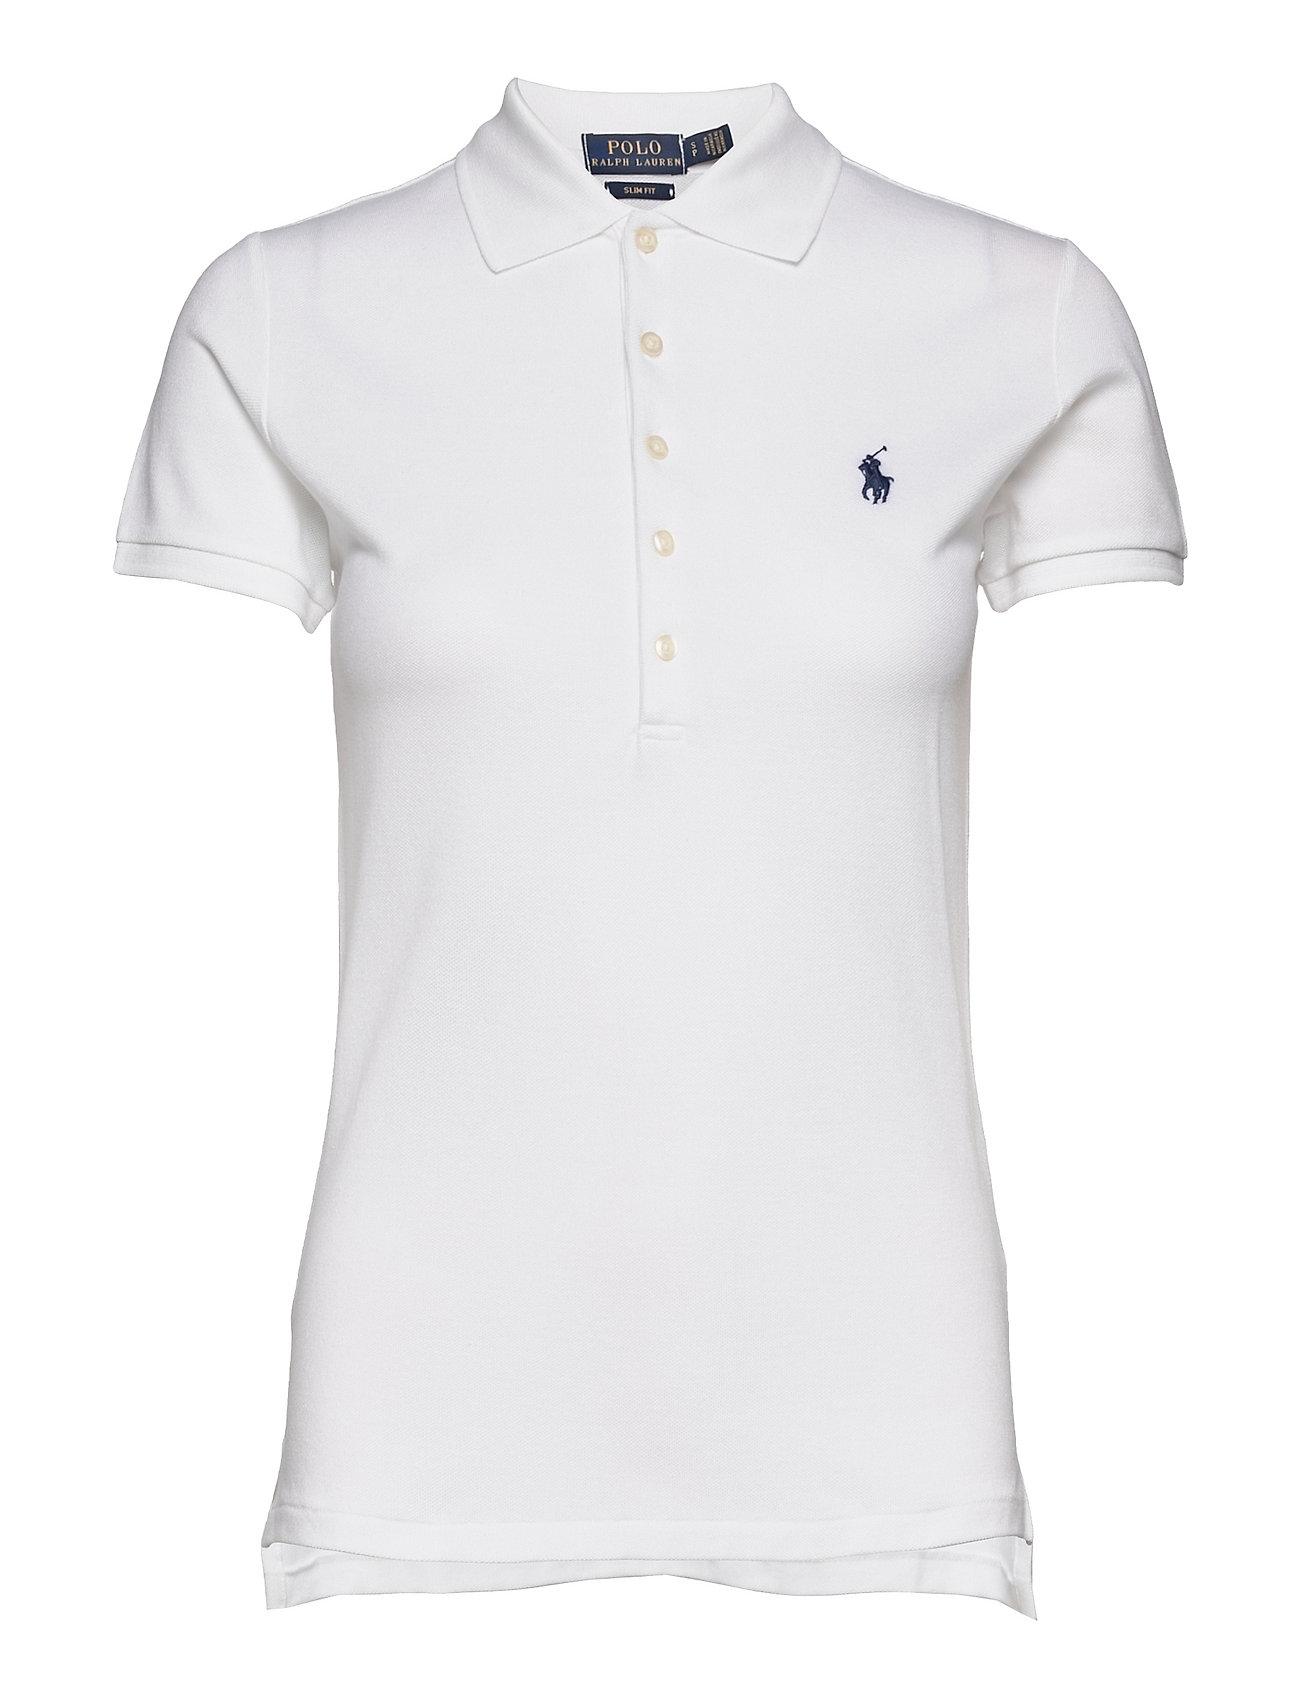 white ralph lauren polo shirt slim fit